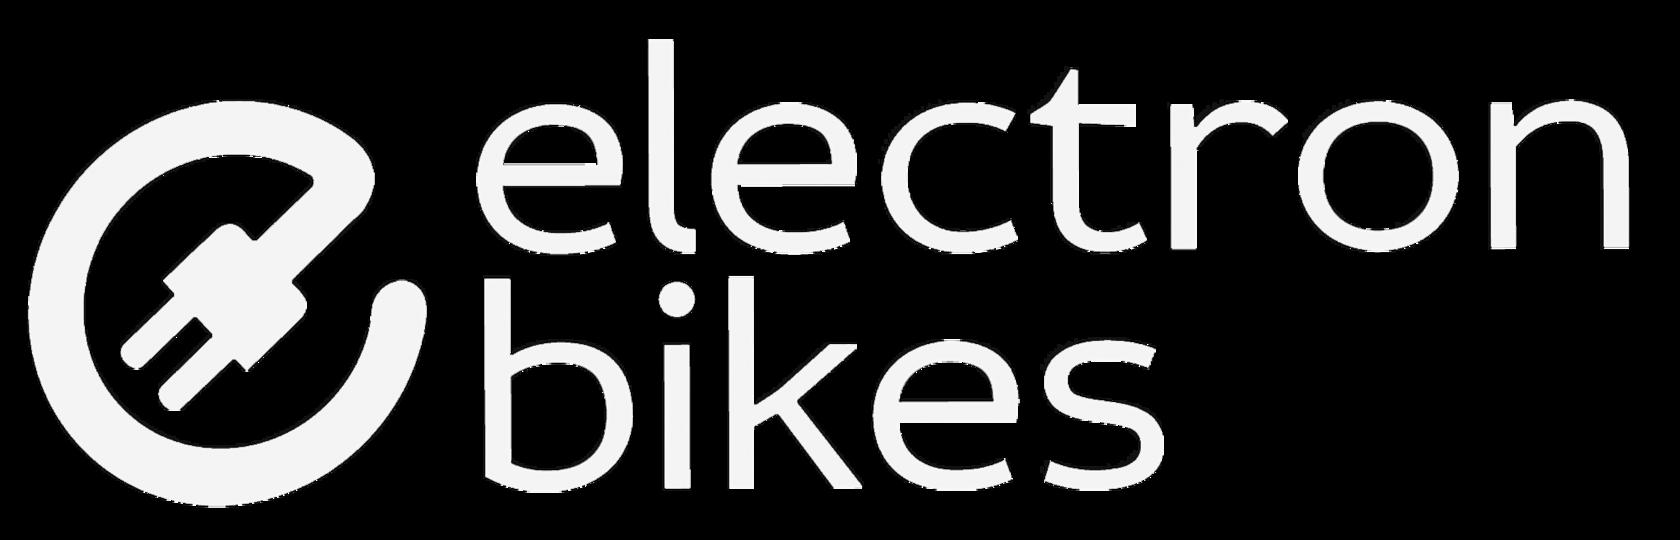 Electronbikes